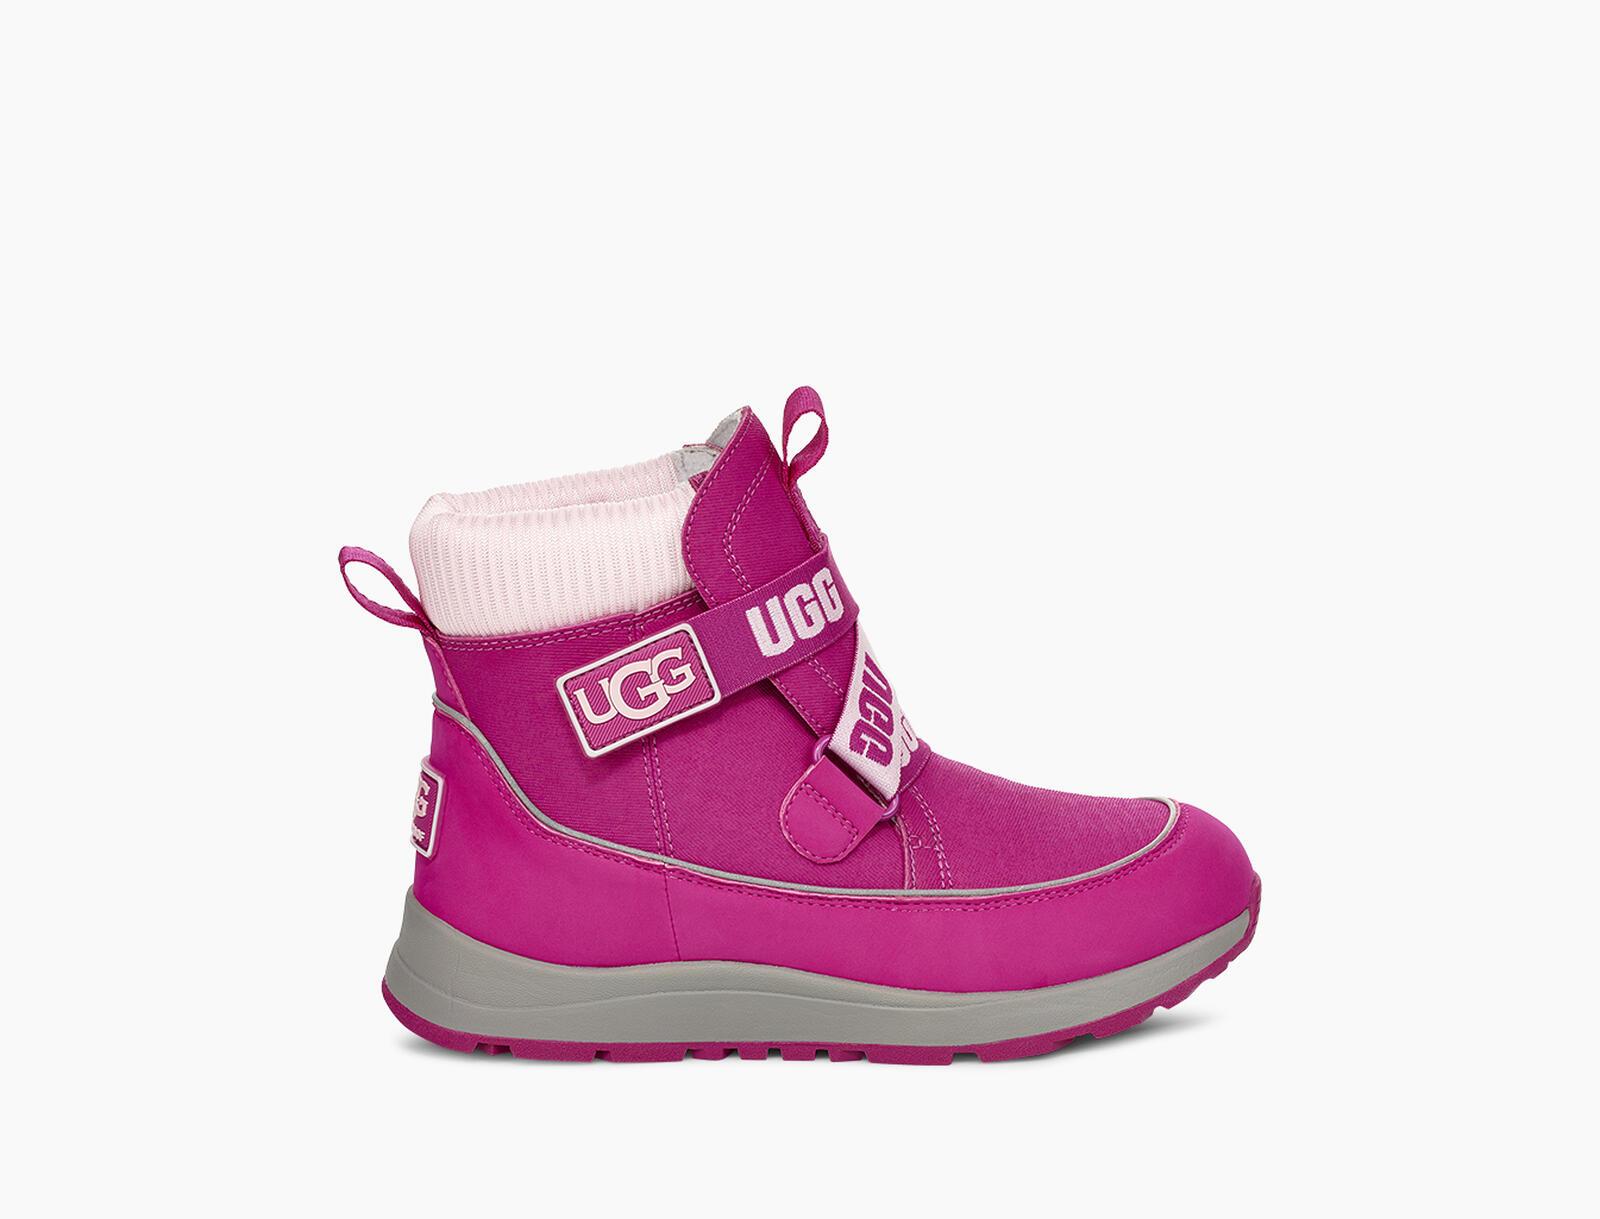 Tabor Waterproof Boot